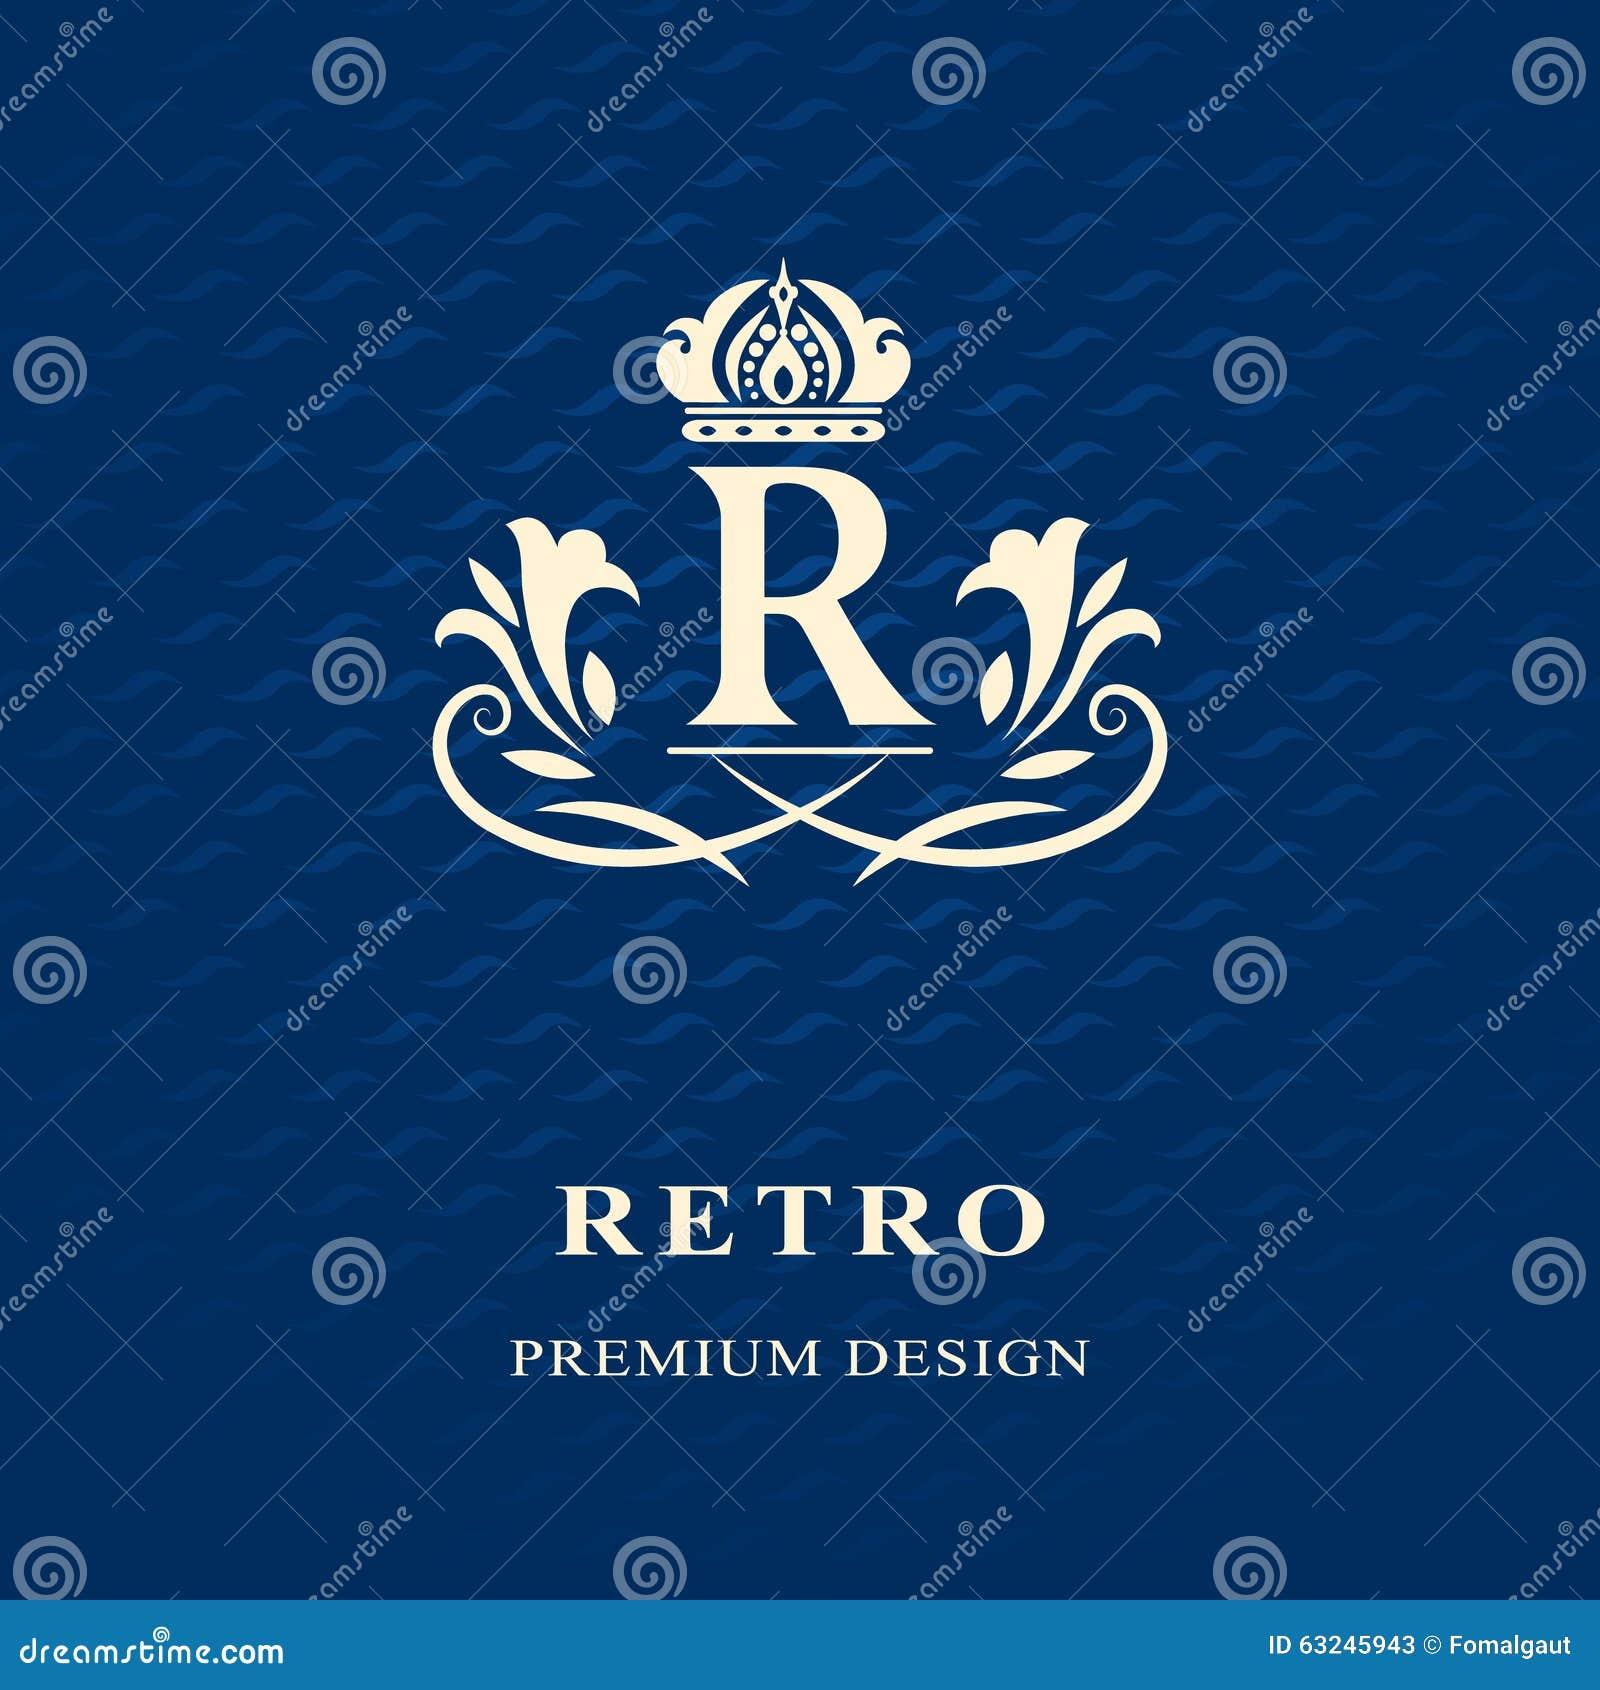 Elements graceful template calligraphic elegant line art logo design